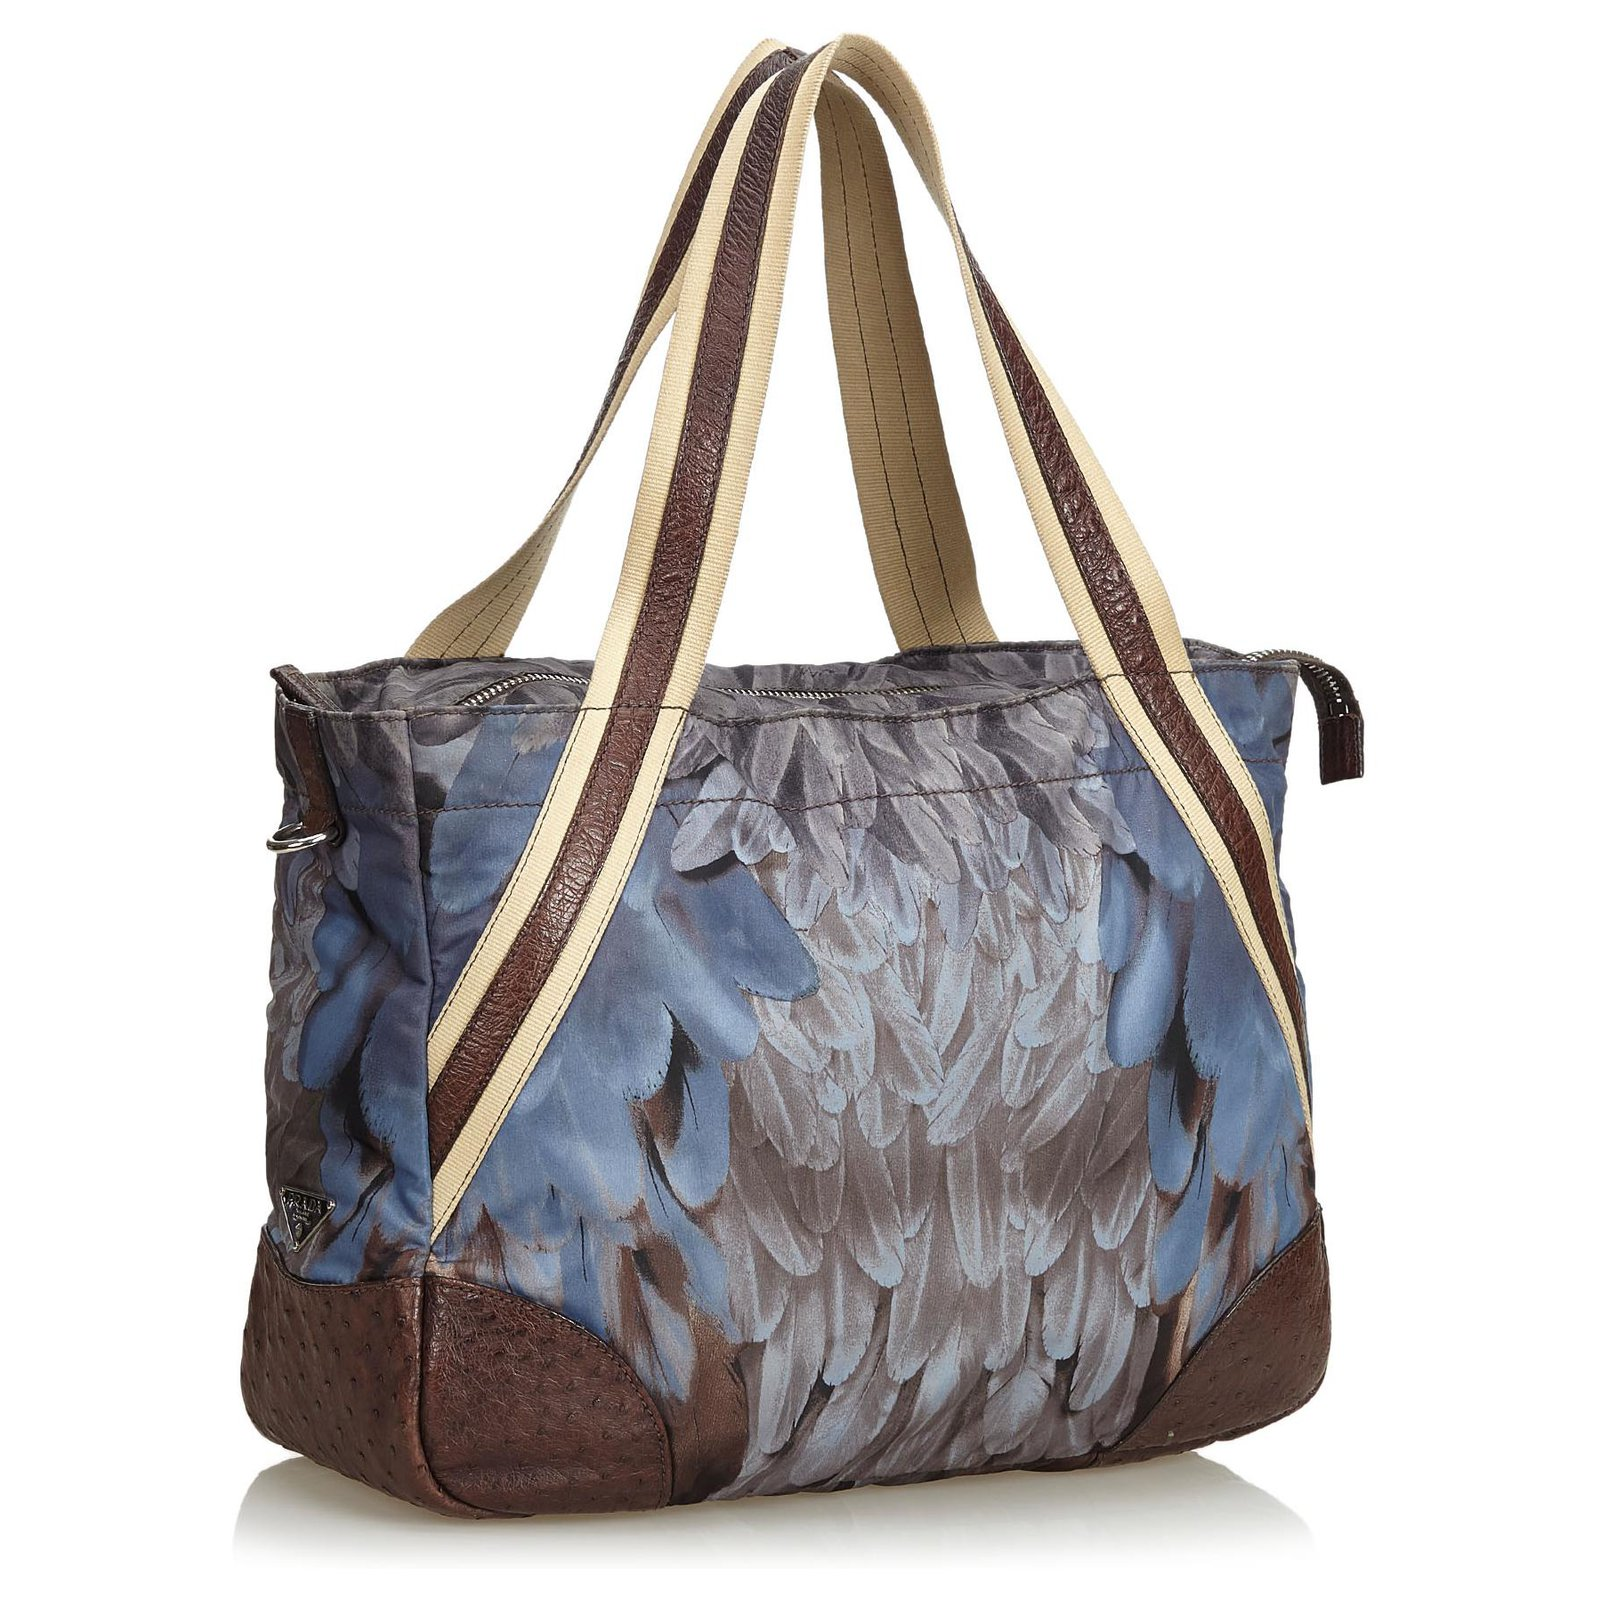 82e222905937 Prada Prada Blue Printed Nylon Weekender Travel bag Leather,Other,Nylon,Cloth  Blue,Multiple colors ref.125559 - Joli Closet